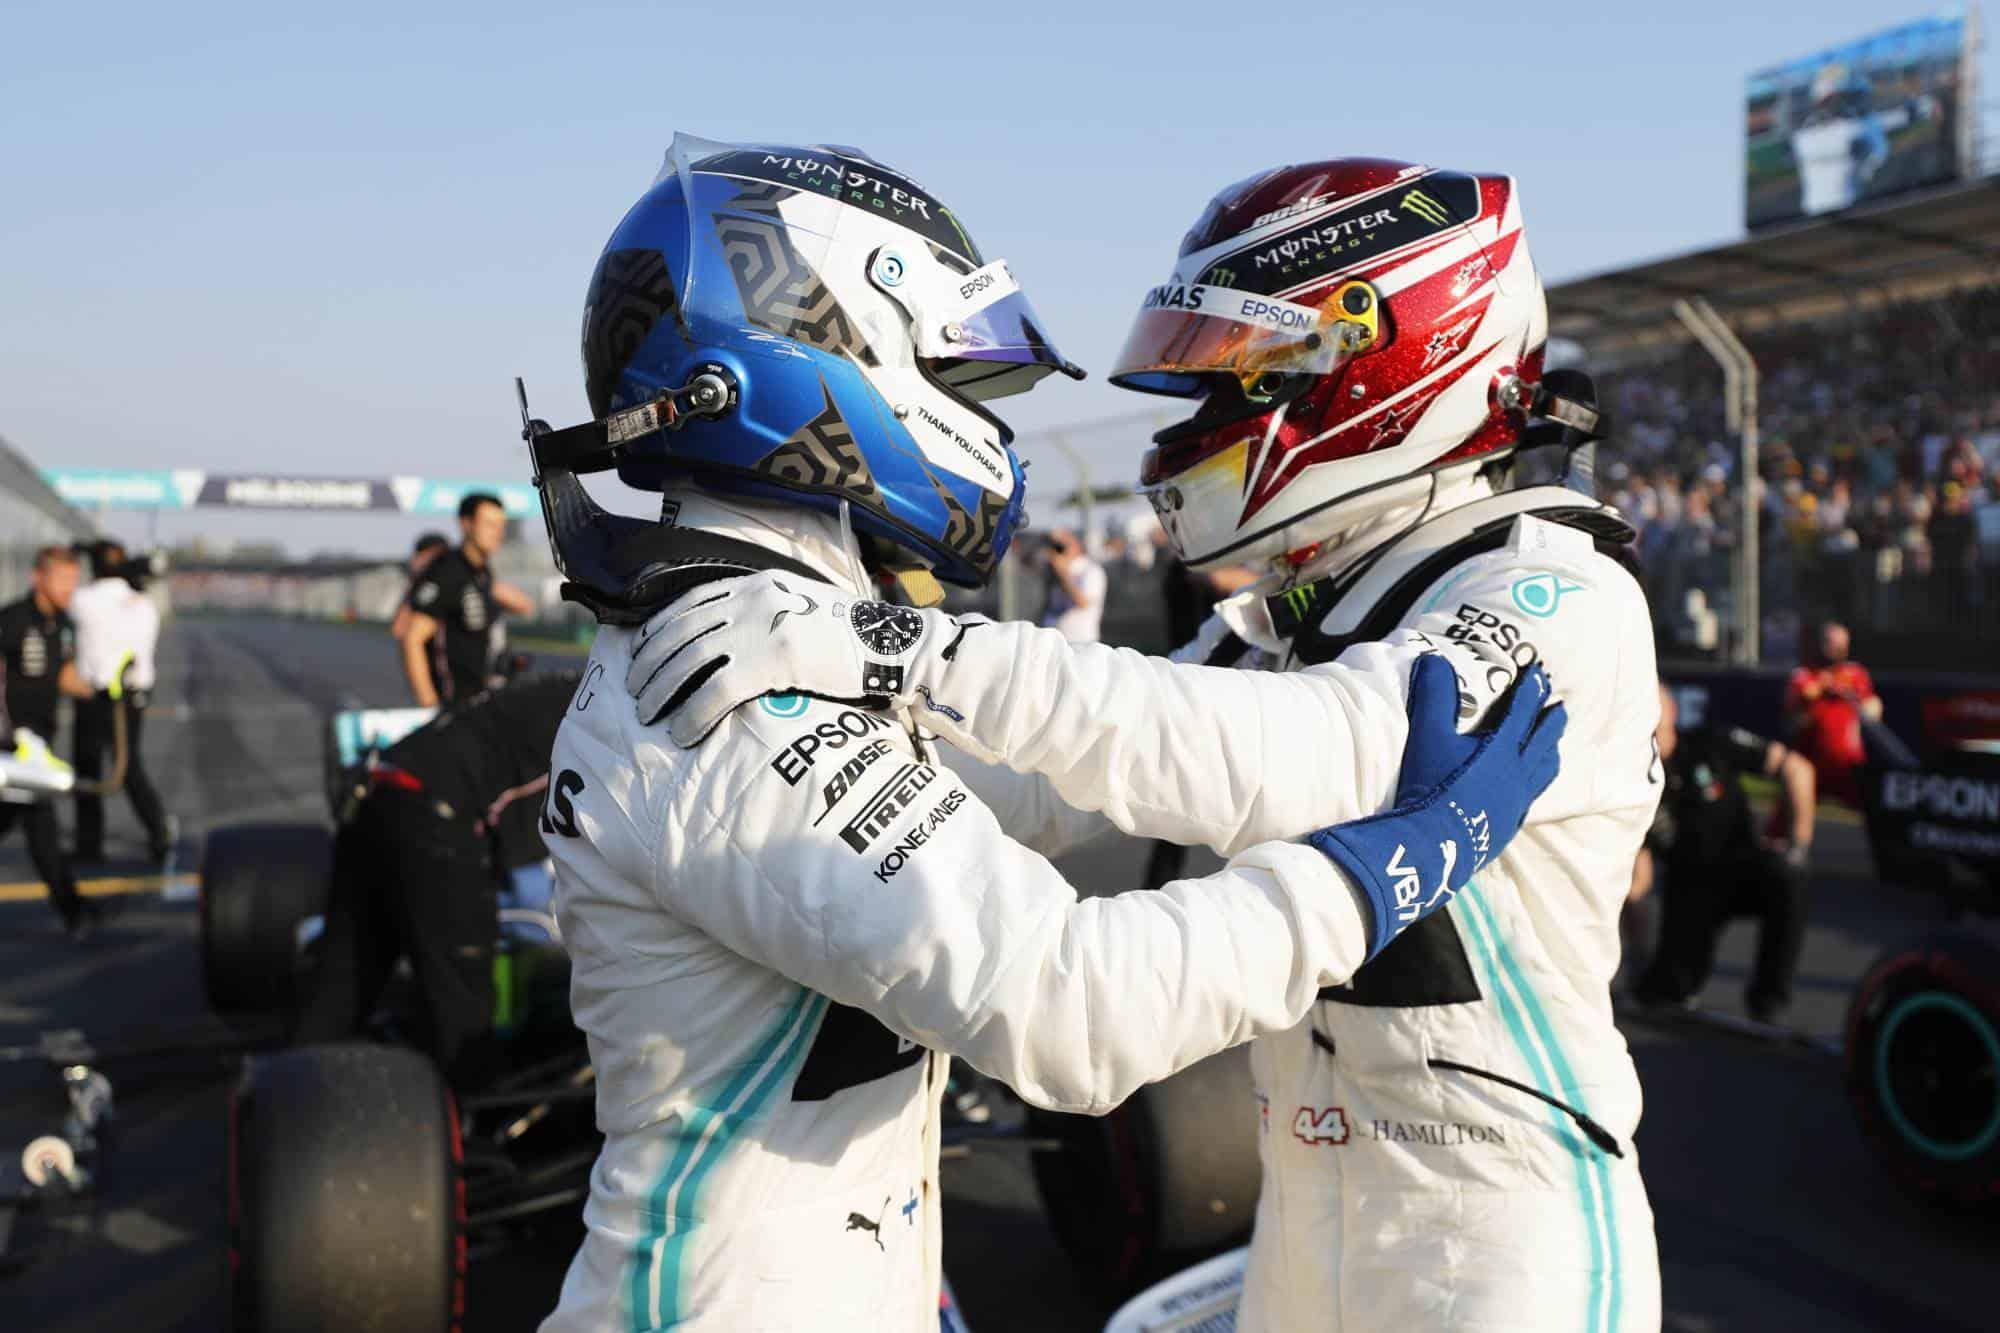 Valtteri Bottas and Lewis Hamilton Mercedes Australian GP F1 2019 helmets post qualifying Photo Daimler Edited by MAXF1net